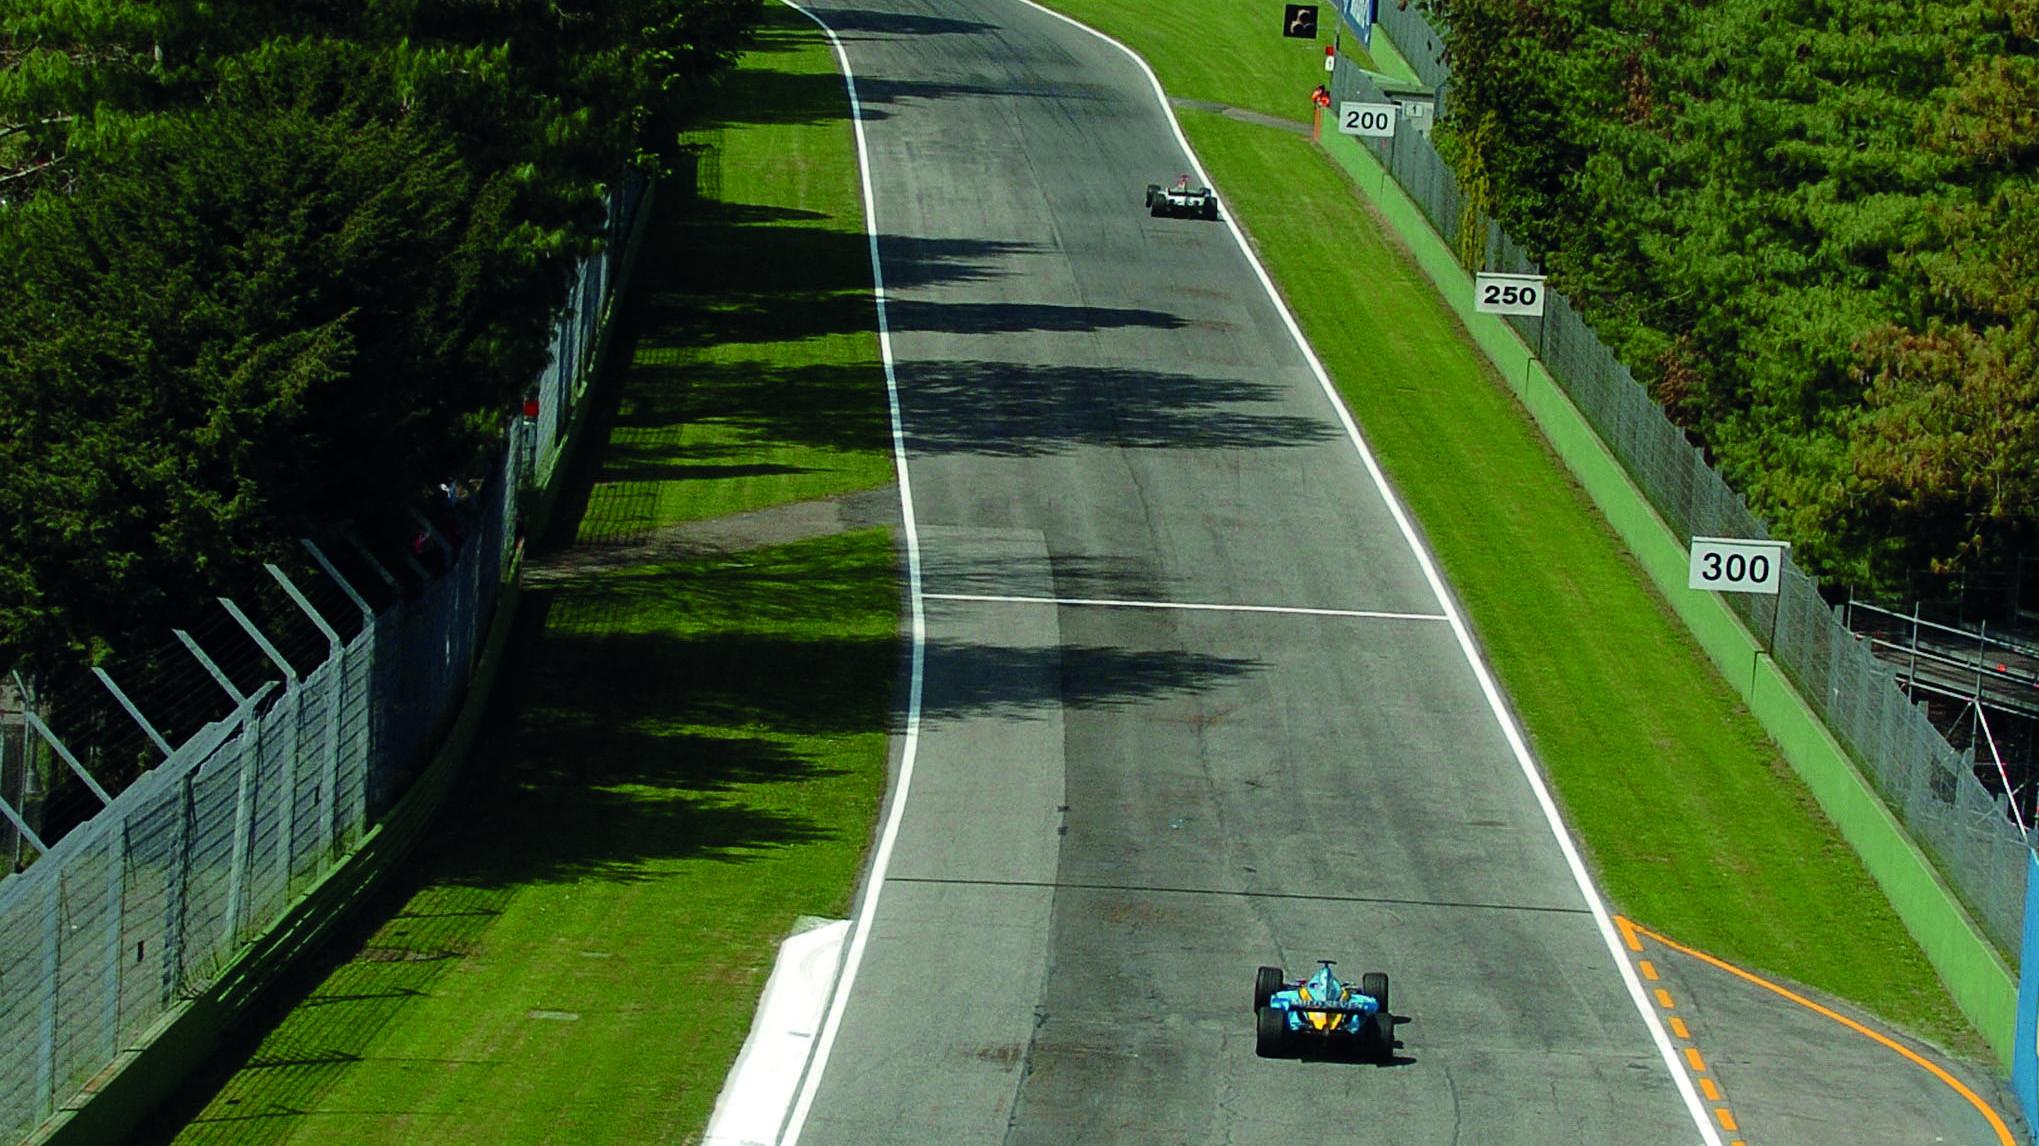 Fernando-Alonsos-Renault-on-track-at-Imola-in-the-2004-F1-San-Marino-Grand-Prix